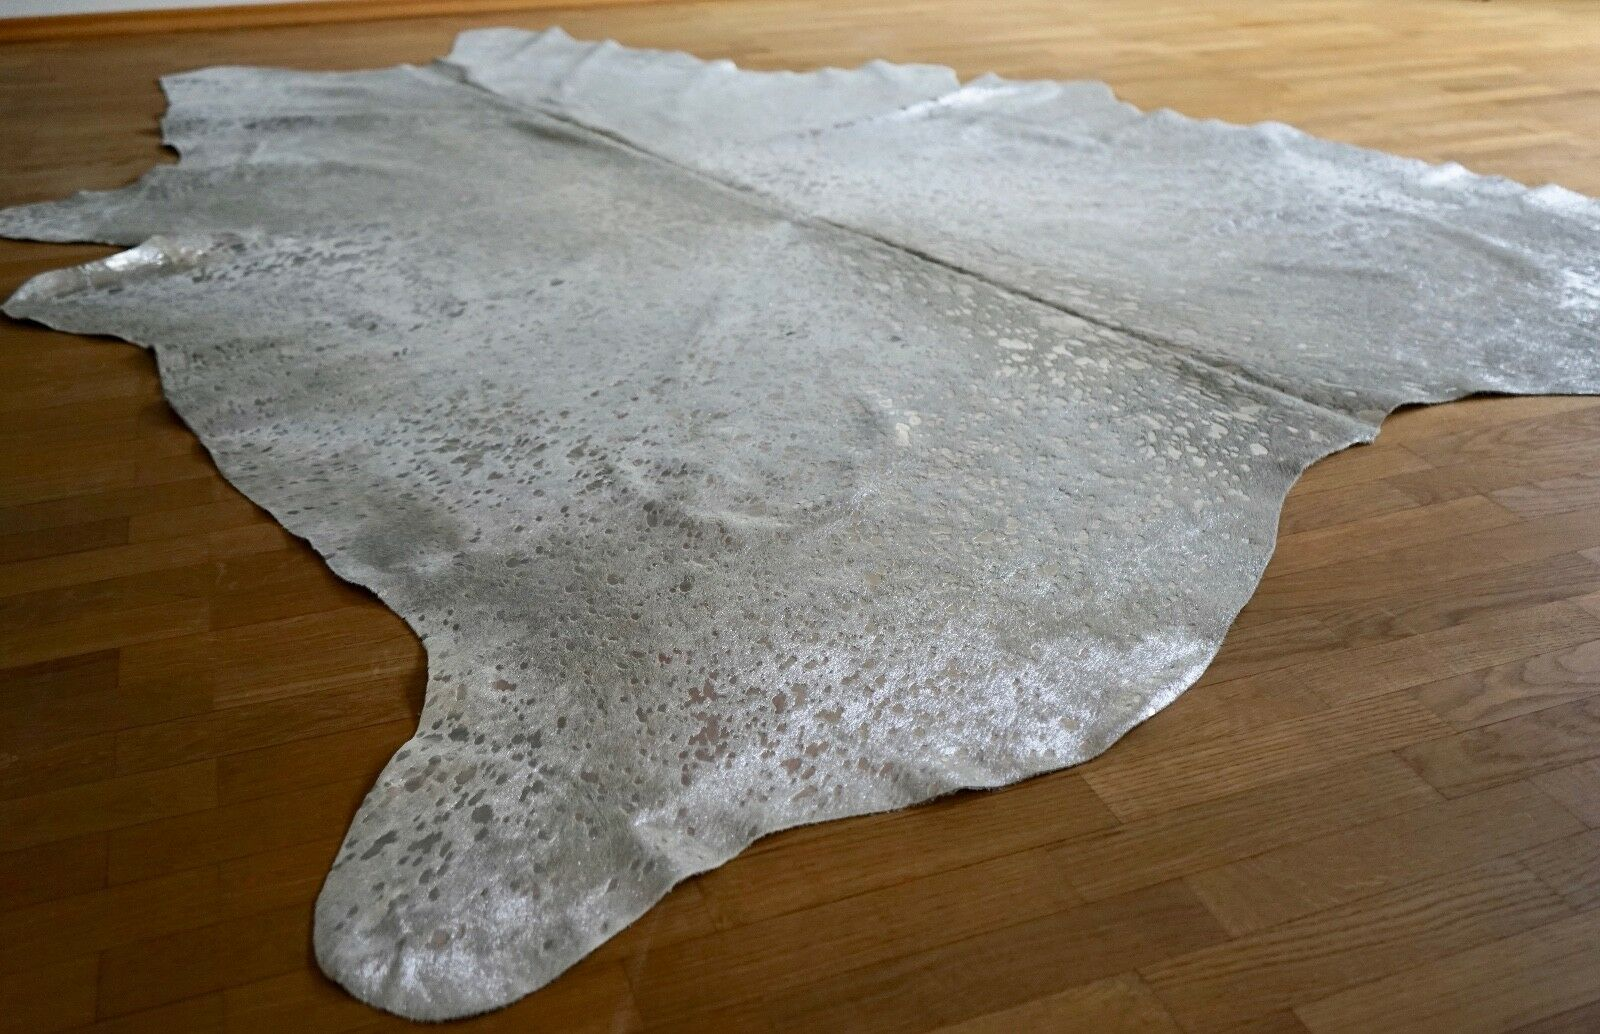 Peau rinderfell Metallic gris clair 190 argent-environ 225 cm x 190 clair cm, Neuf, rug bf6ed1